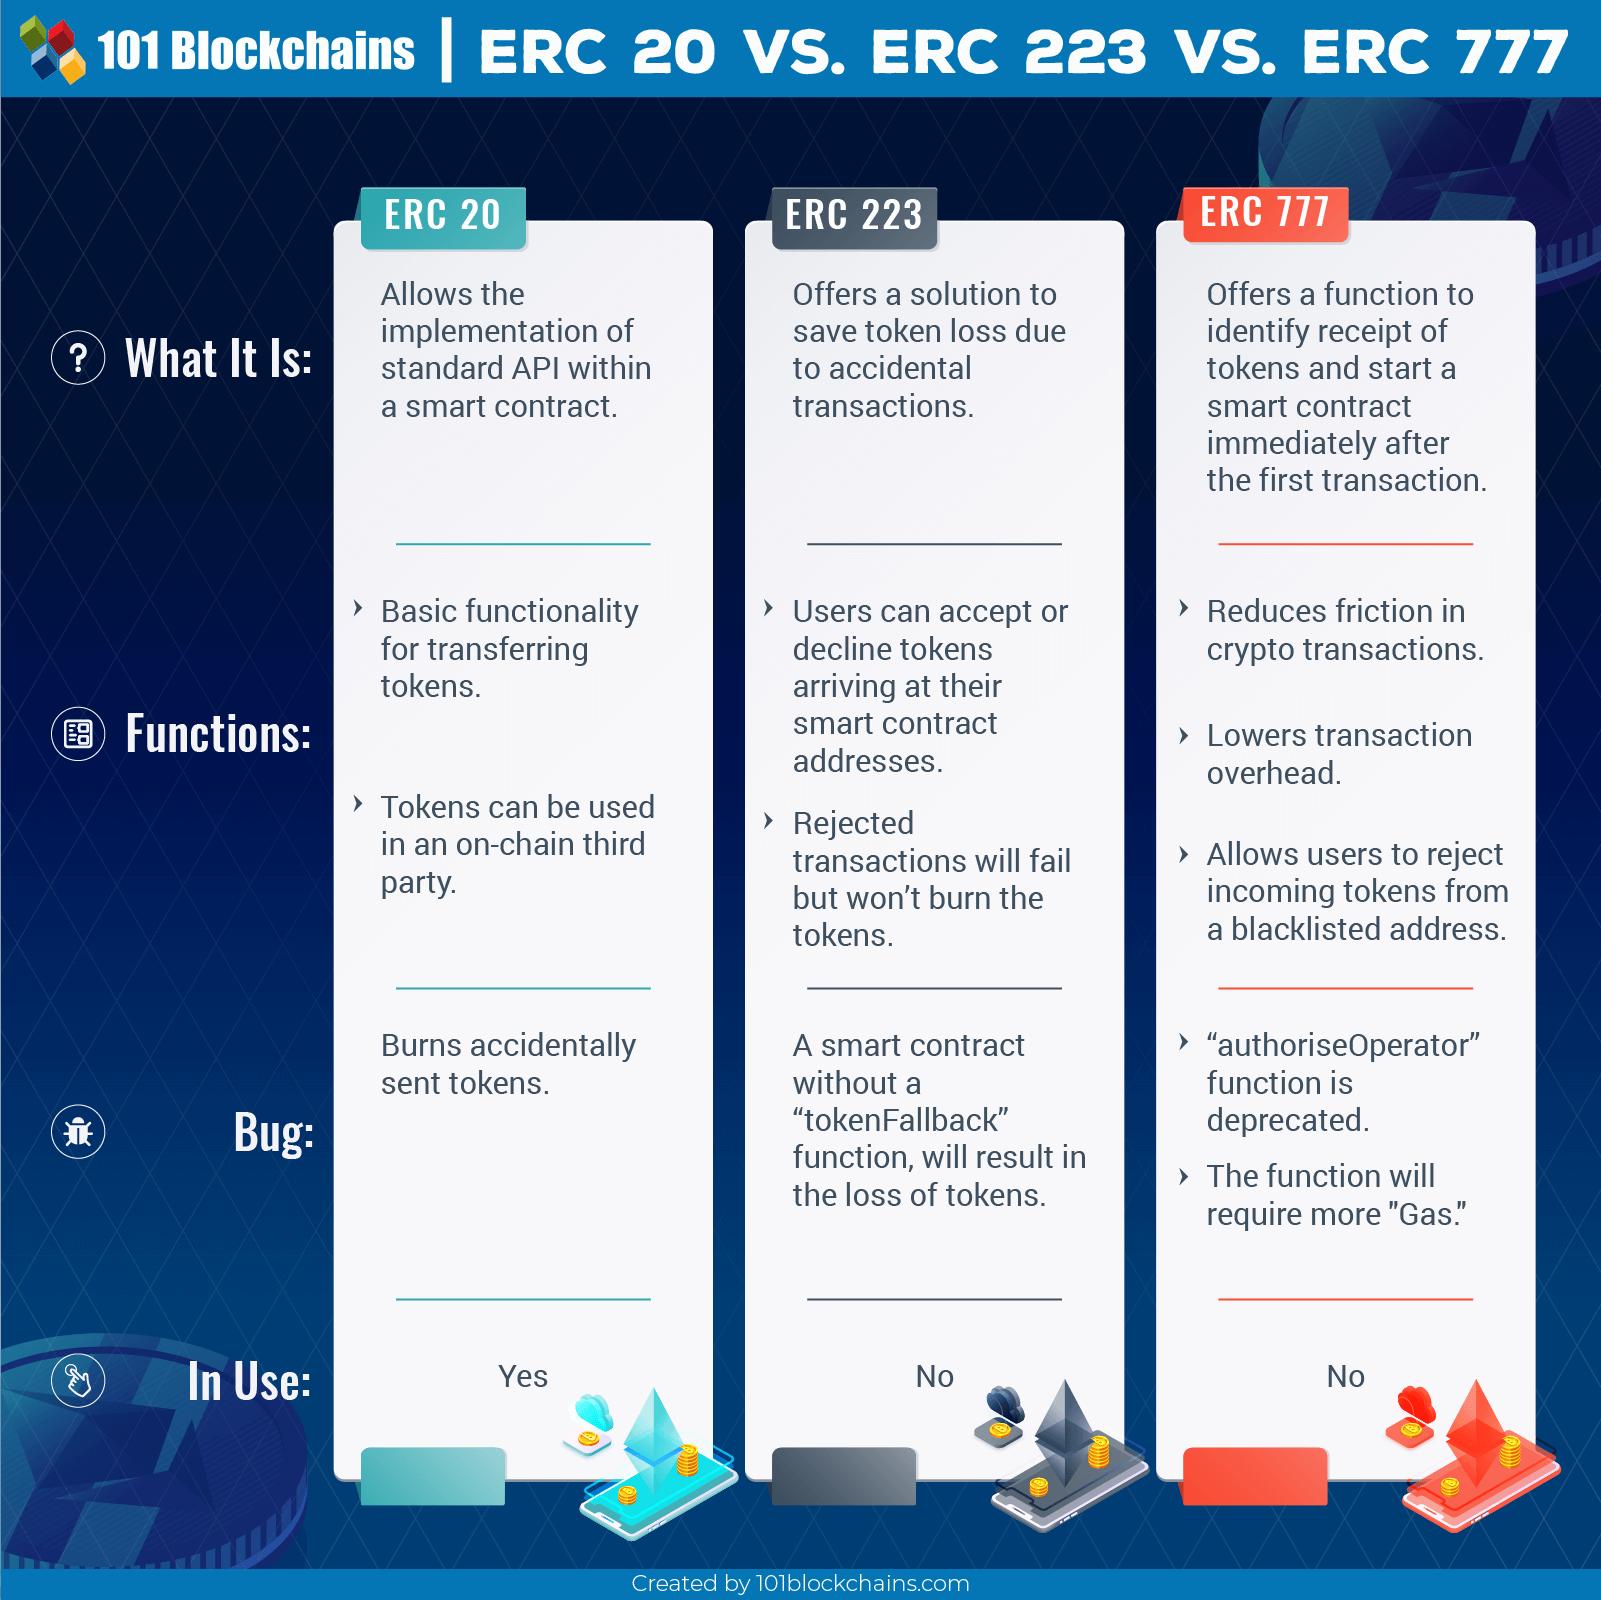 ERC 20 vs ERC 223 vs ERC 777